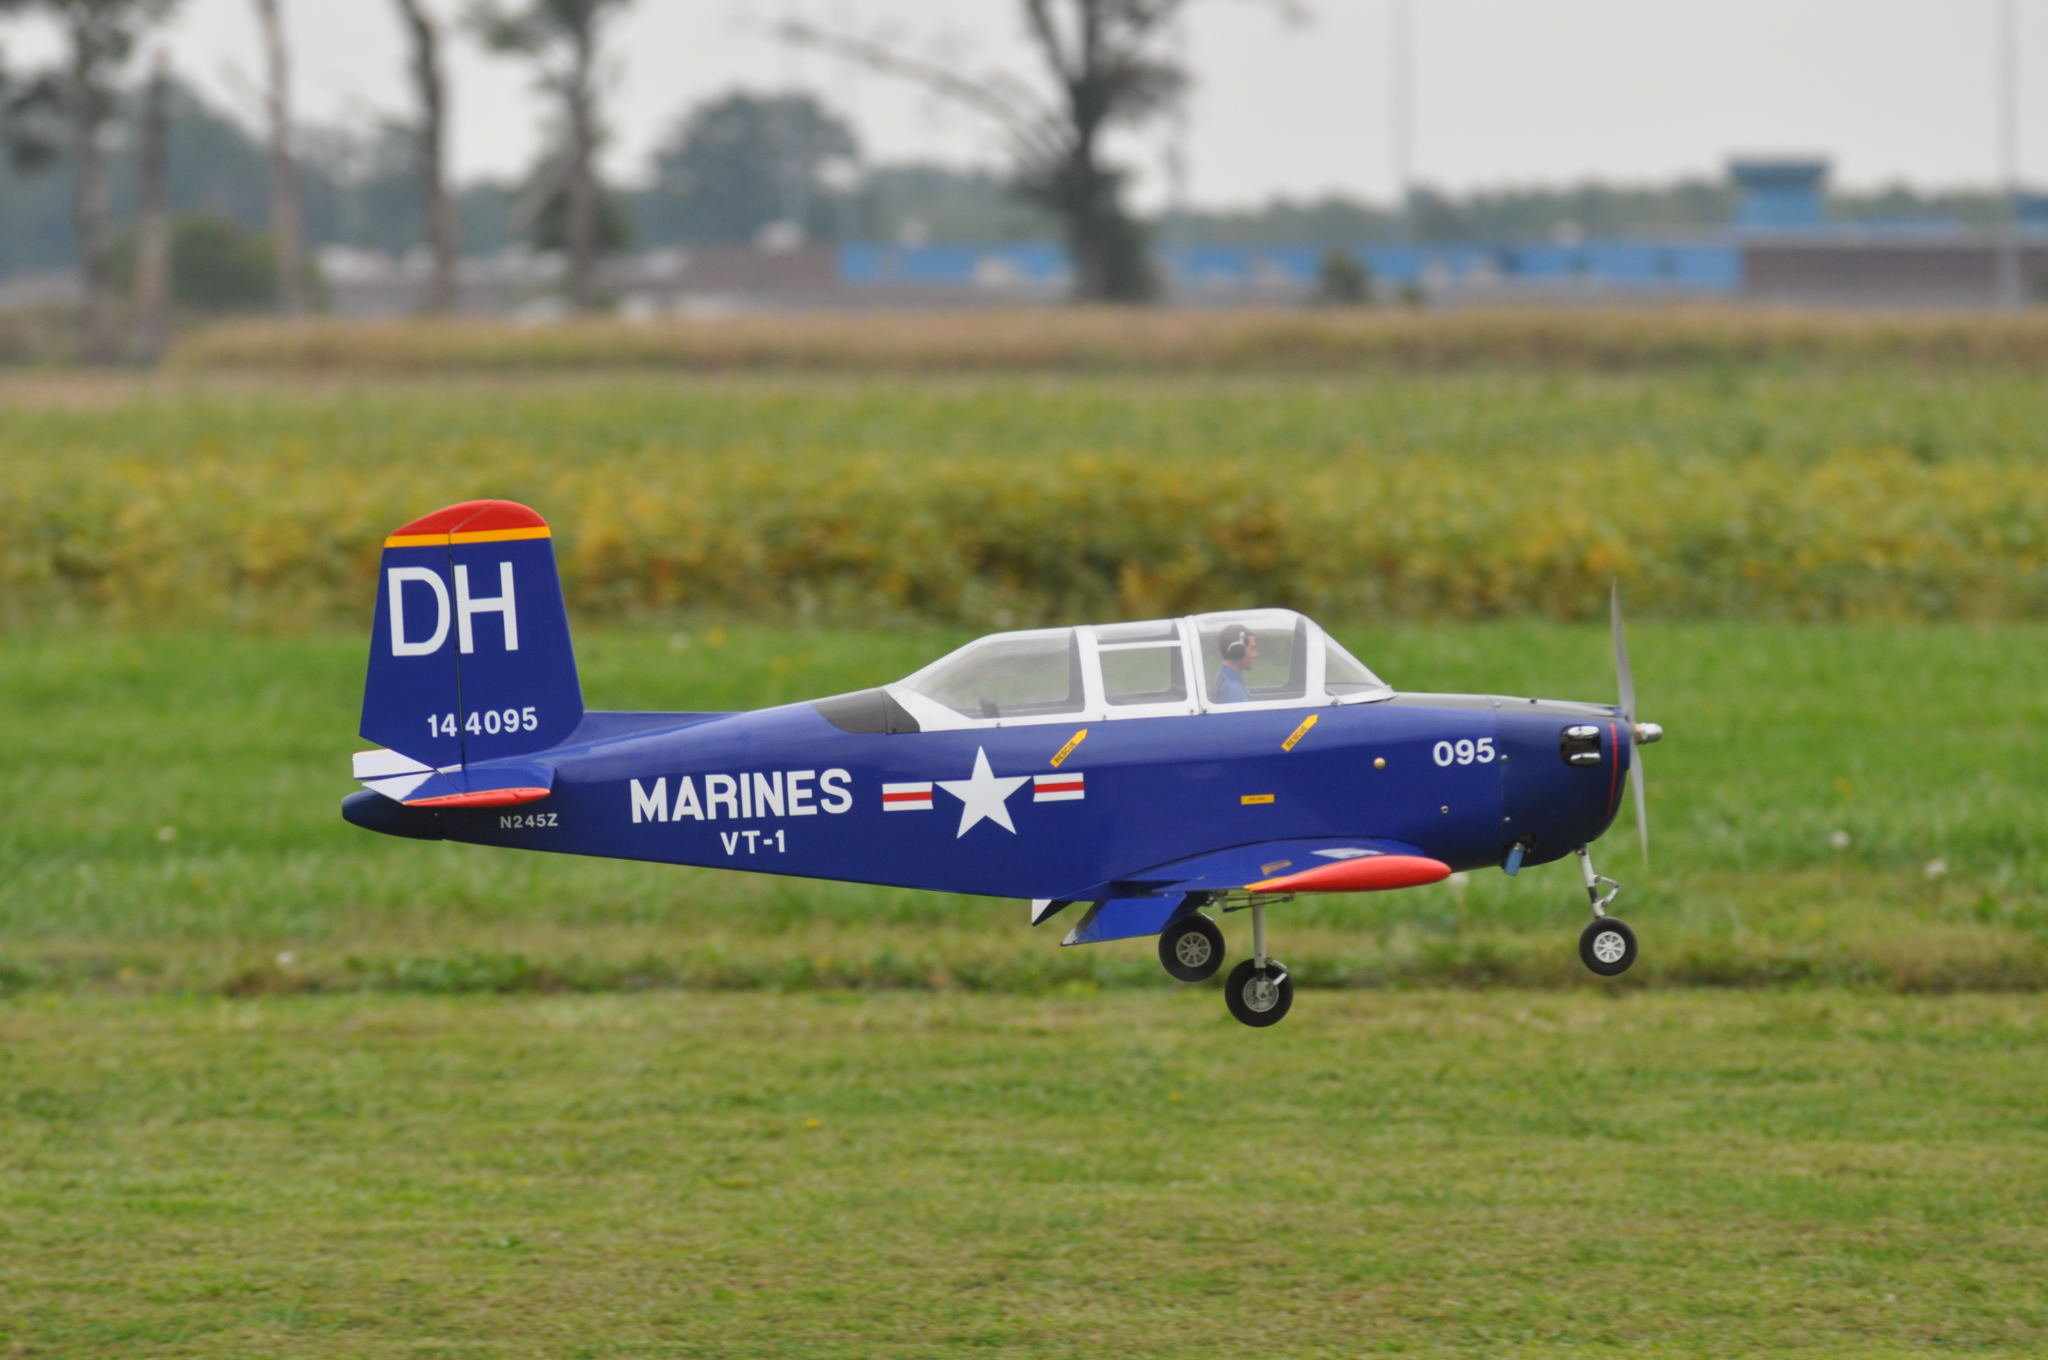 DSC_9351.JPG